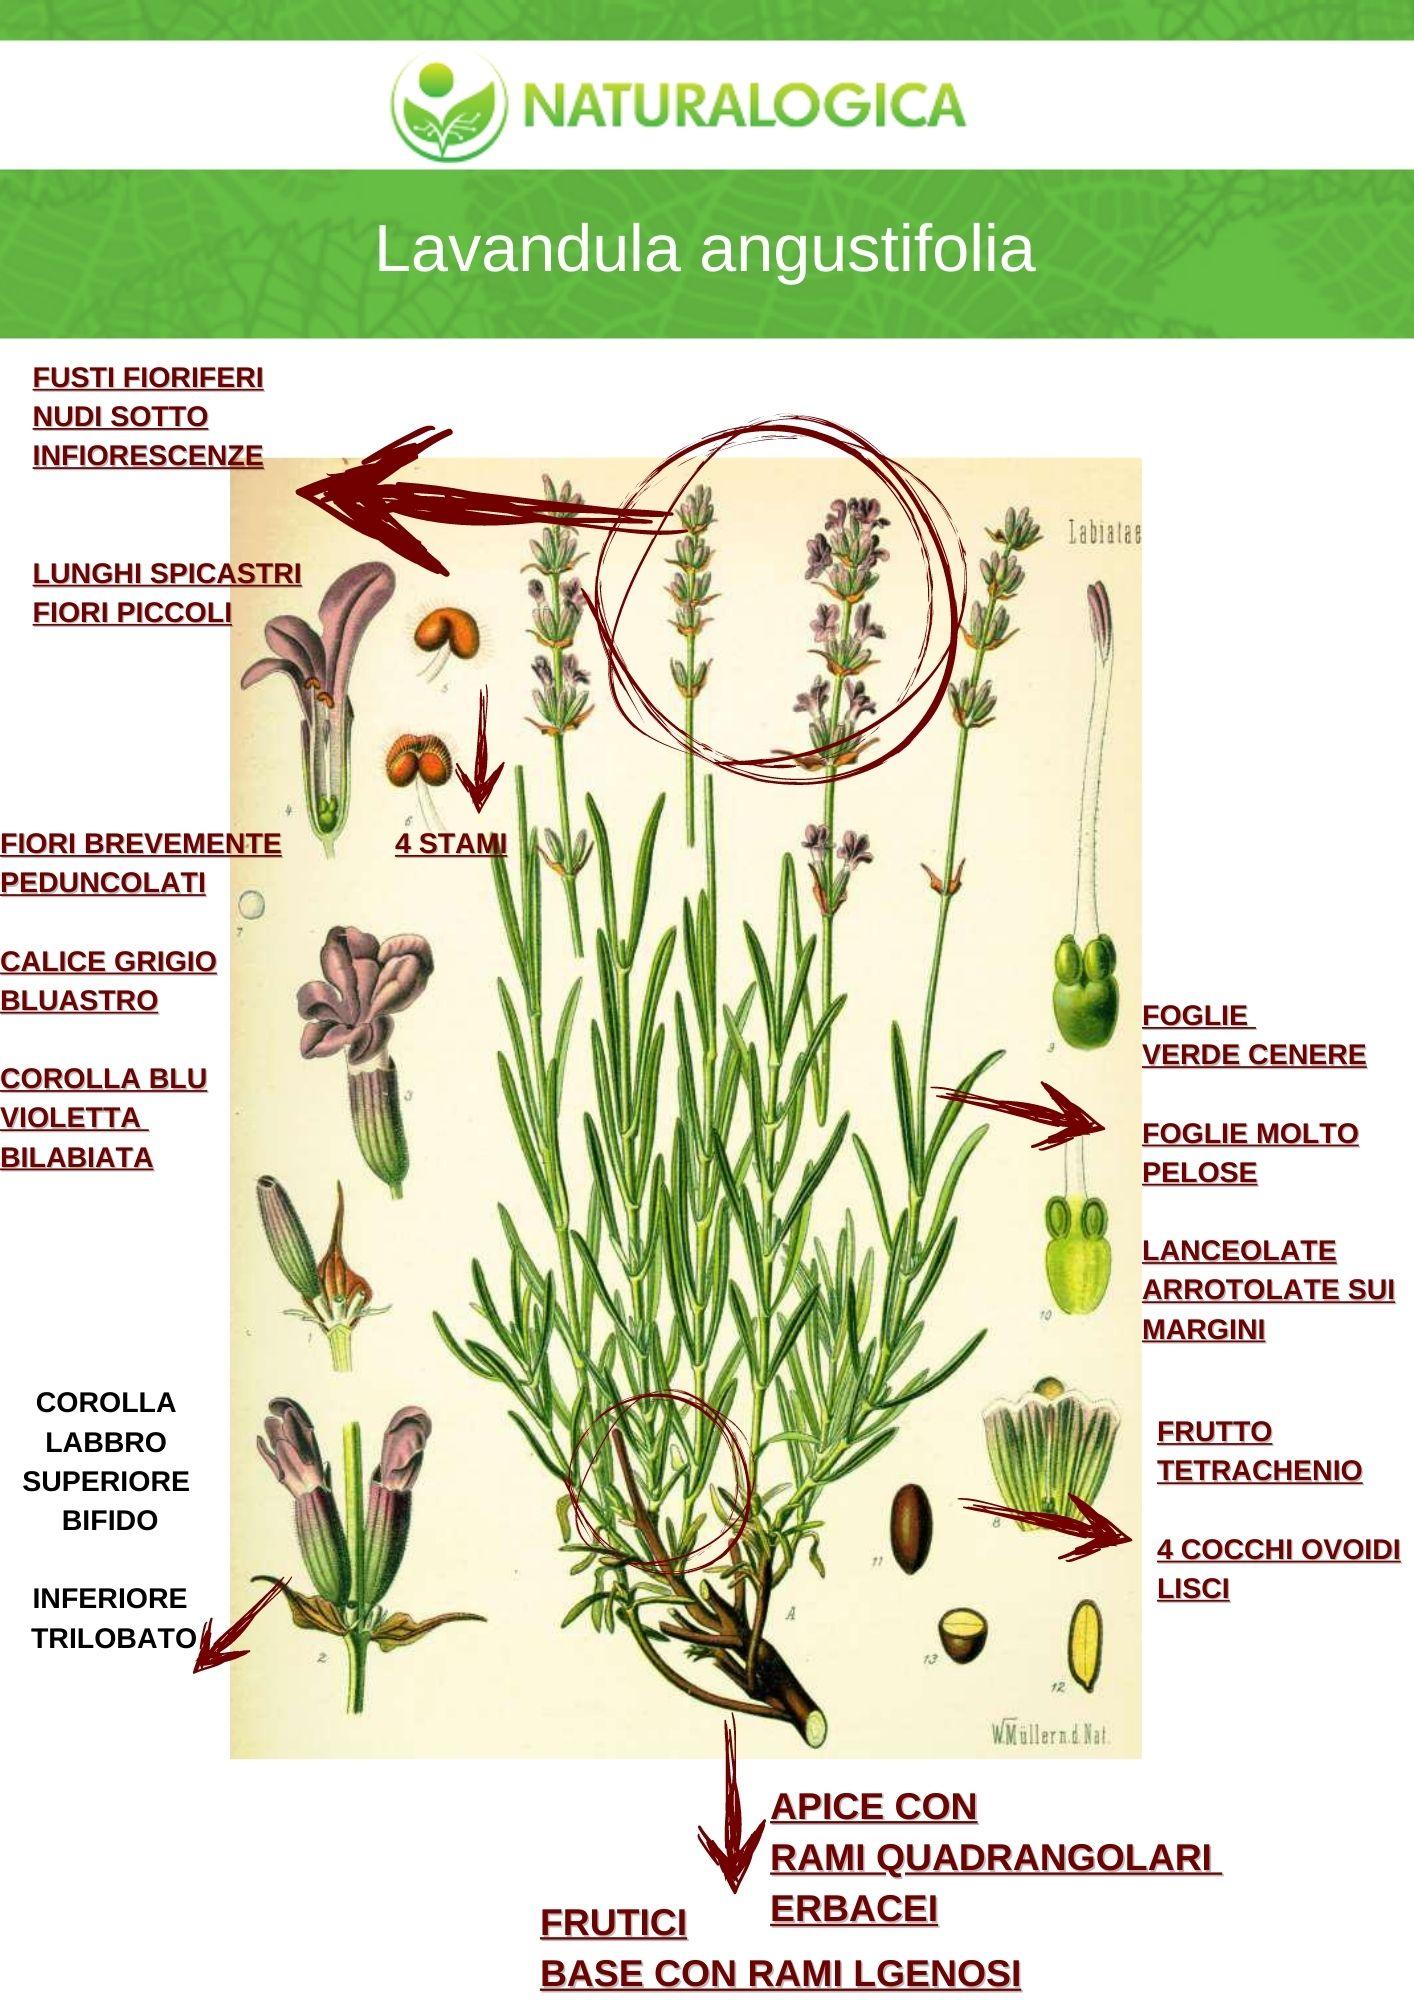 lavanda angustifolia botanica farmaceutica